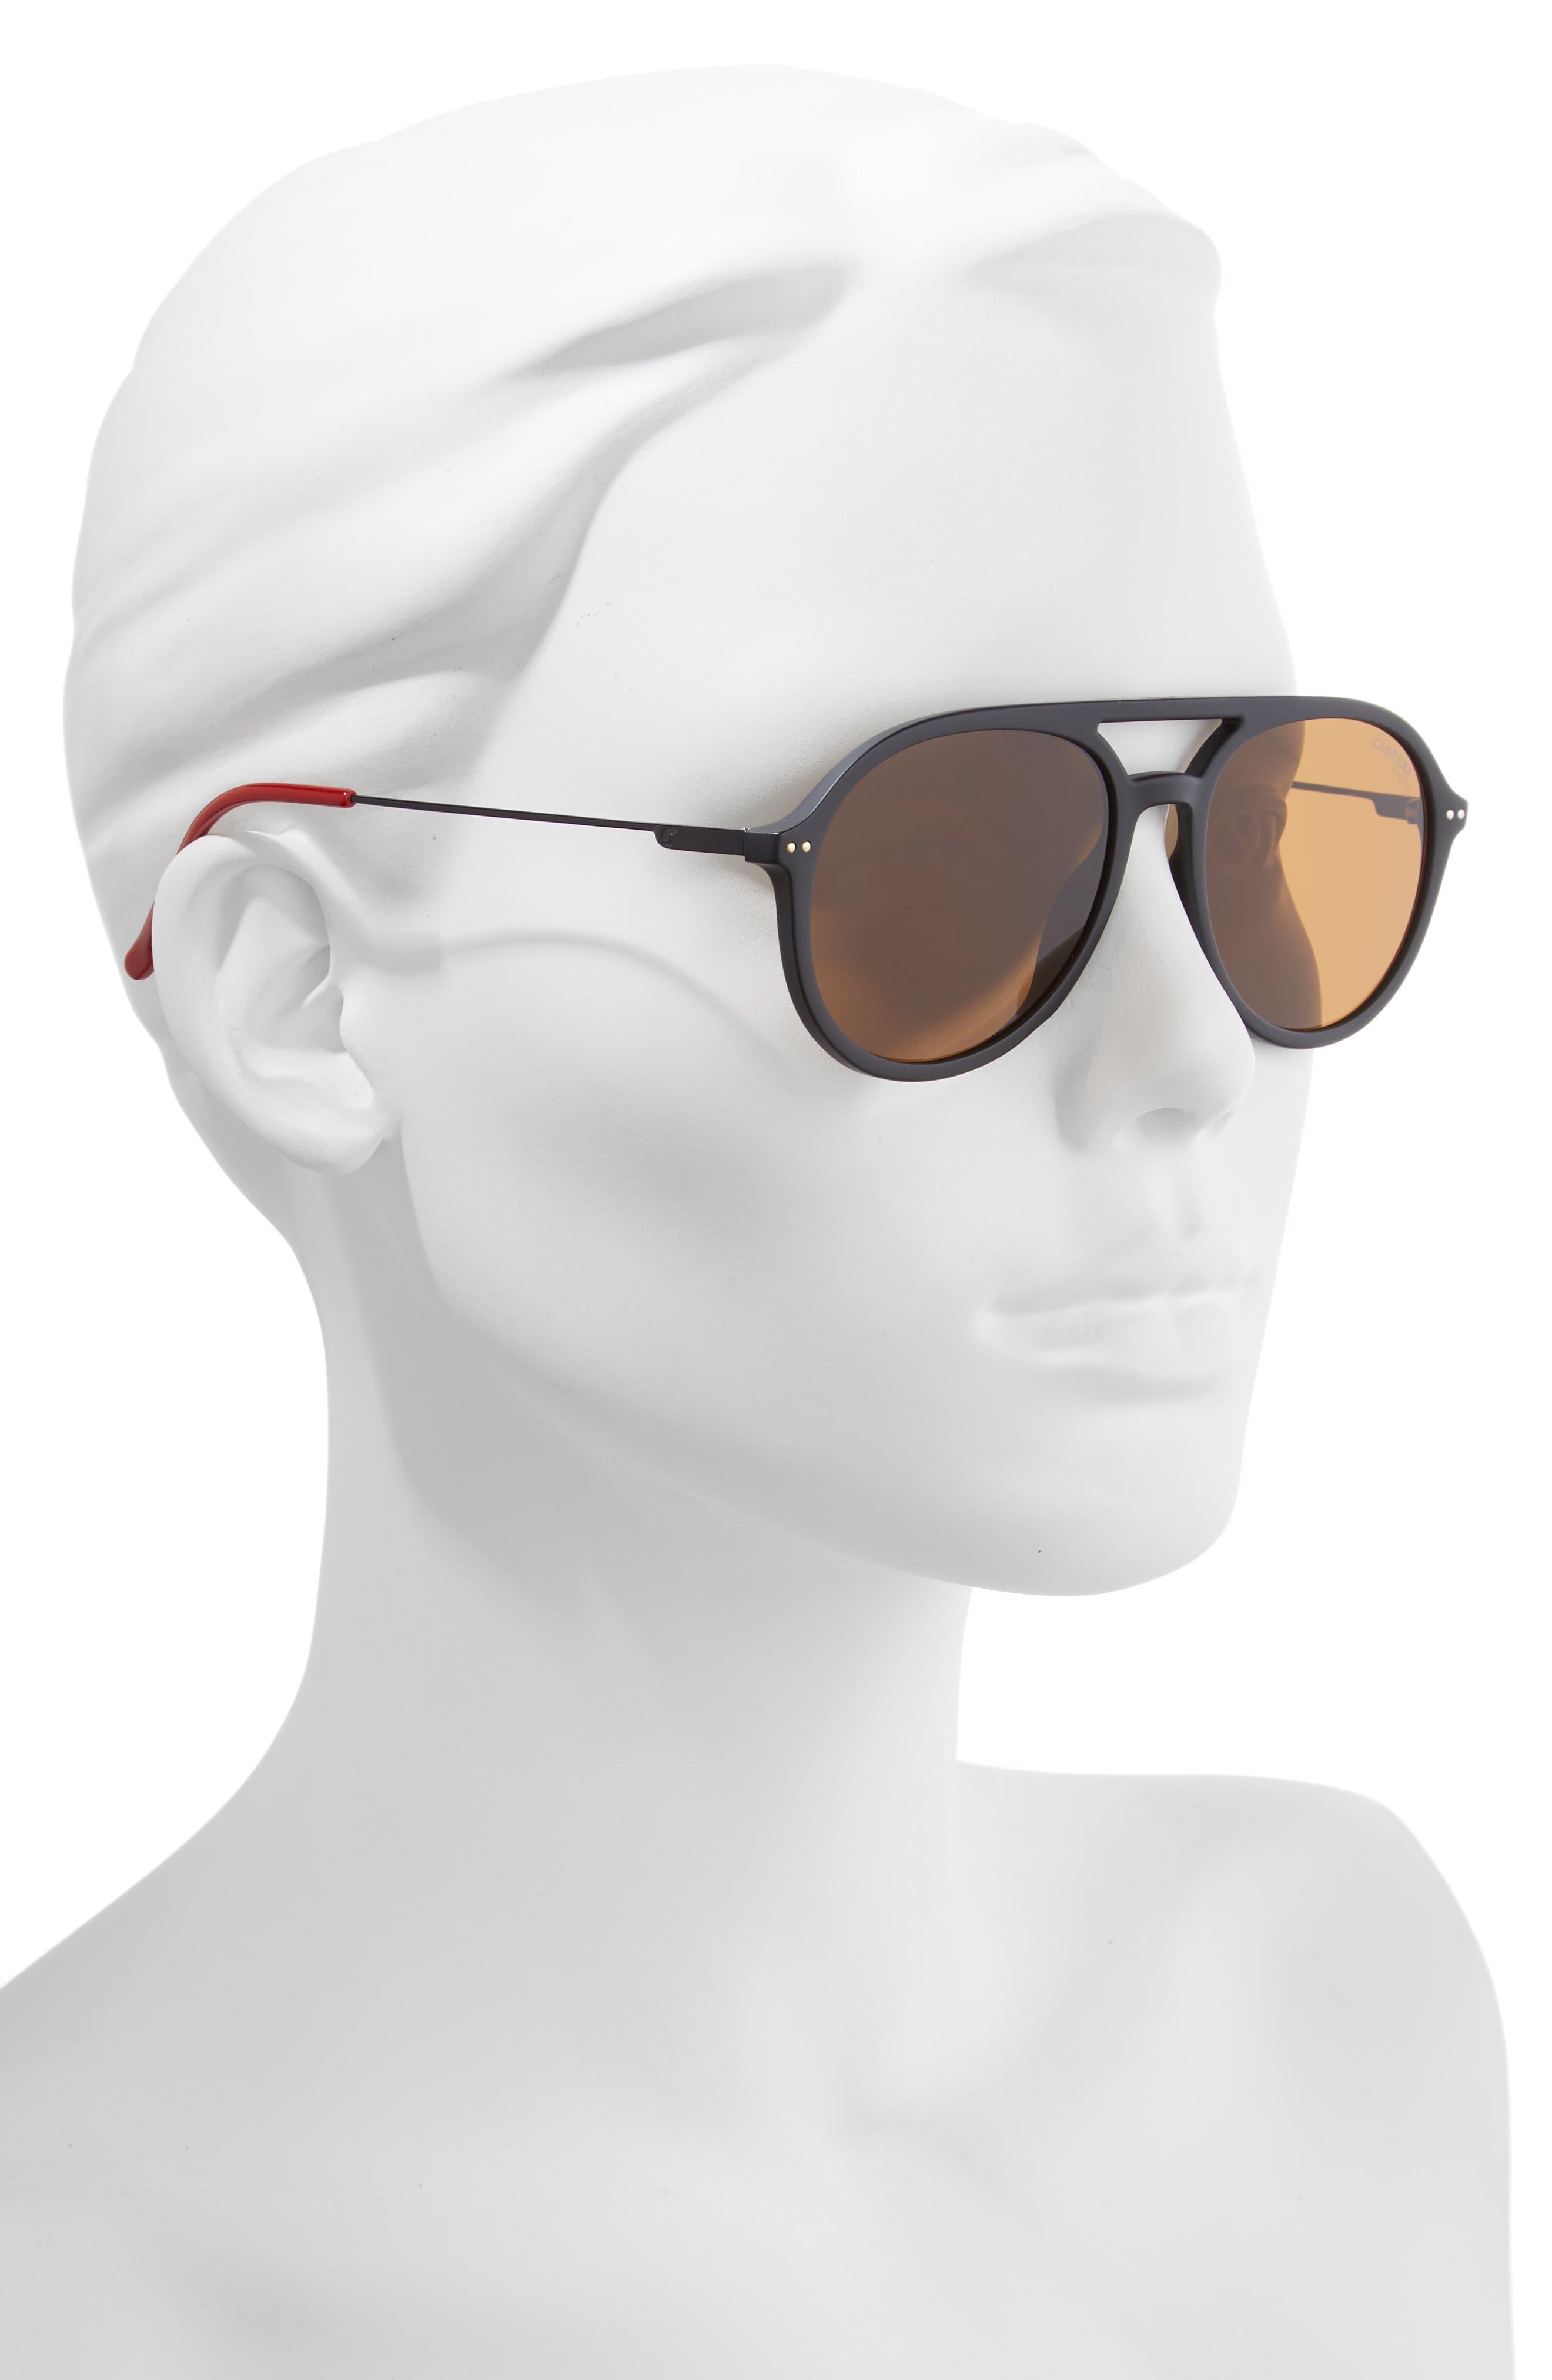 53mm Aviator Sunglasses,                             Alternate thumbnail 2, color,                             MATTE BLACK